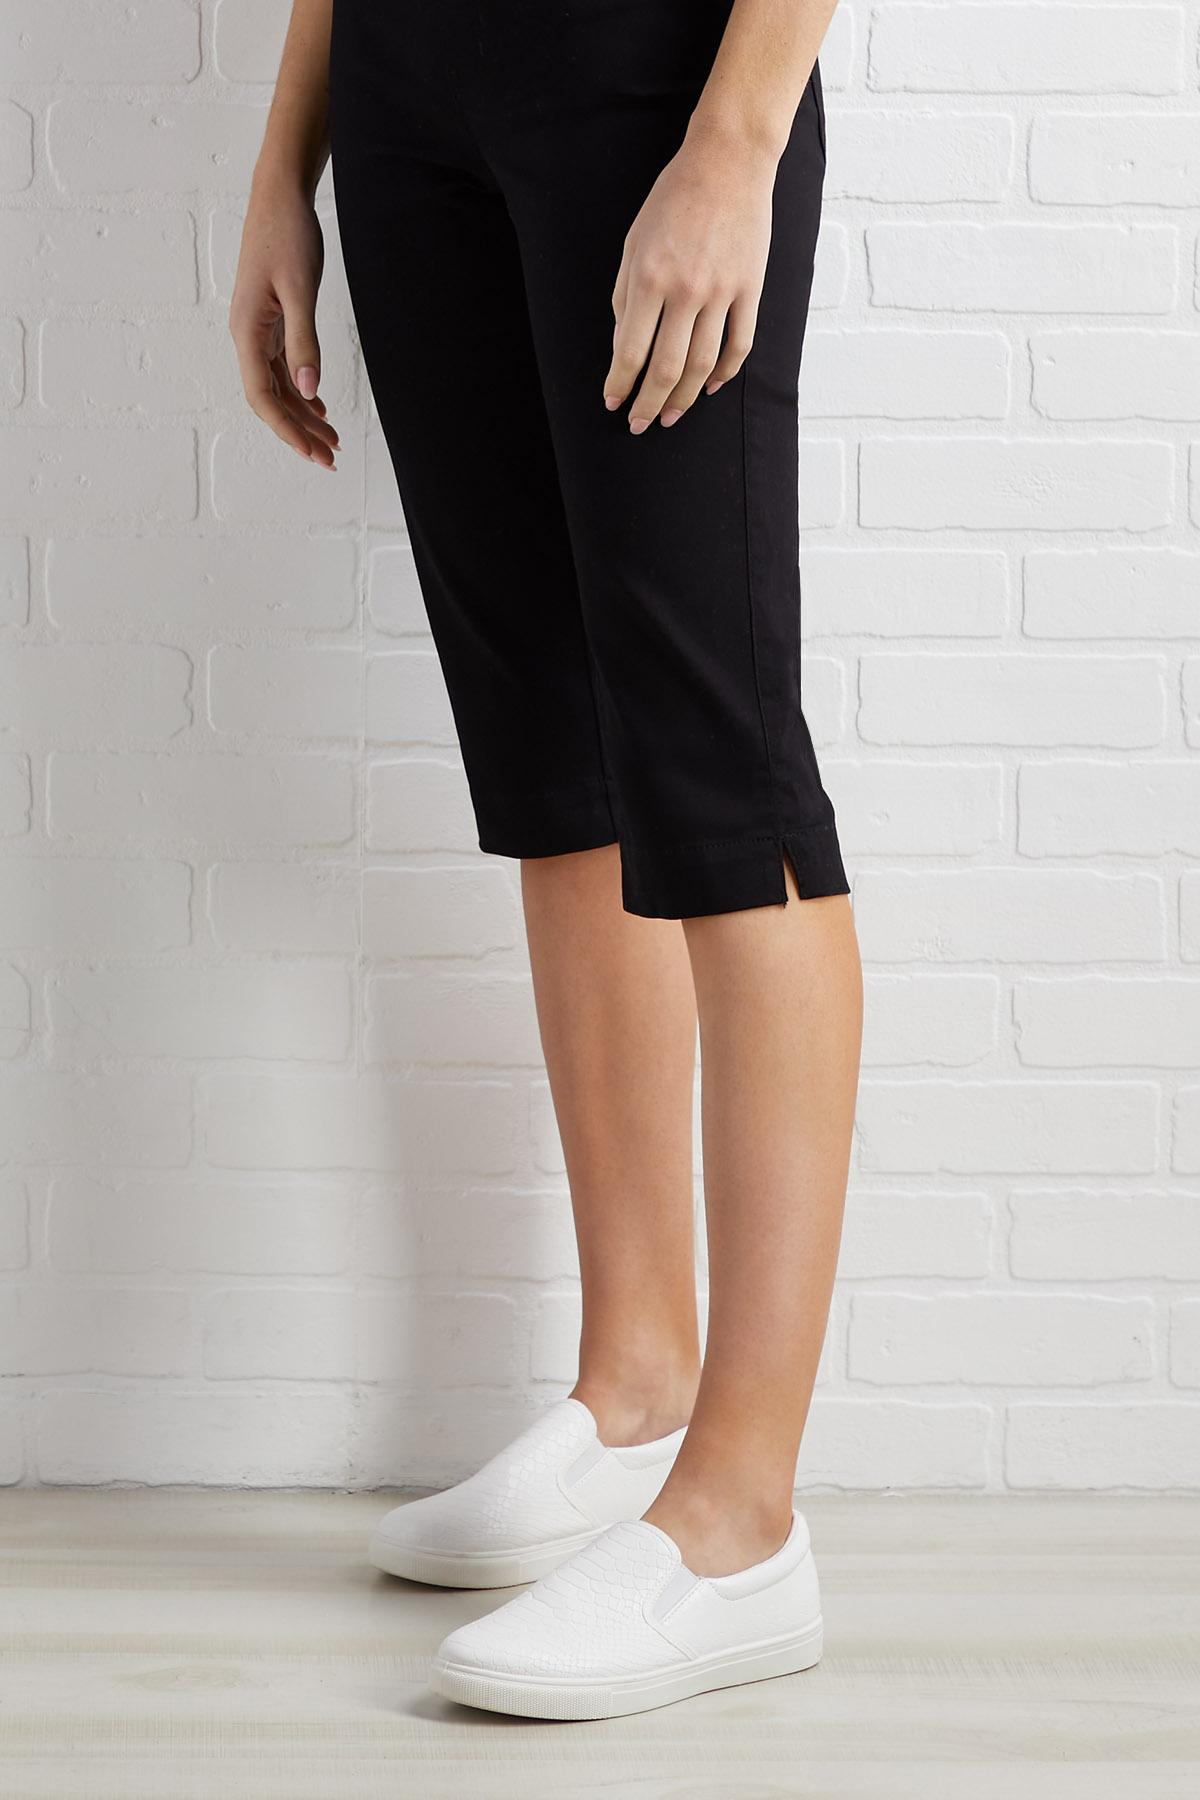 Knee Deep Shorts